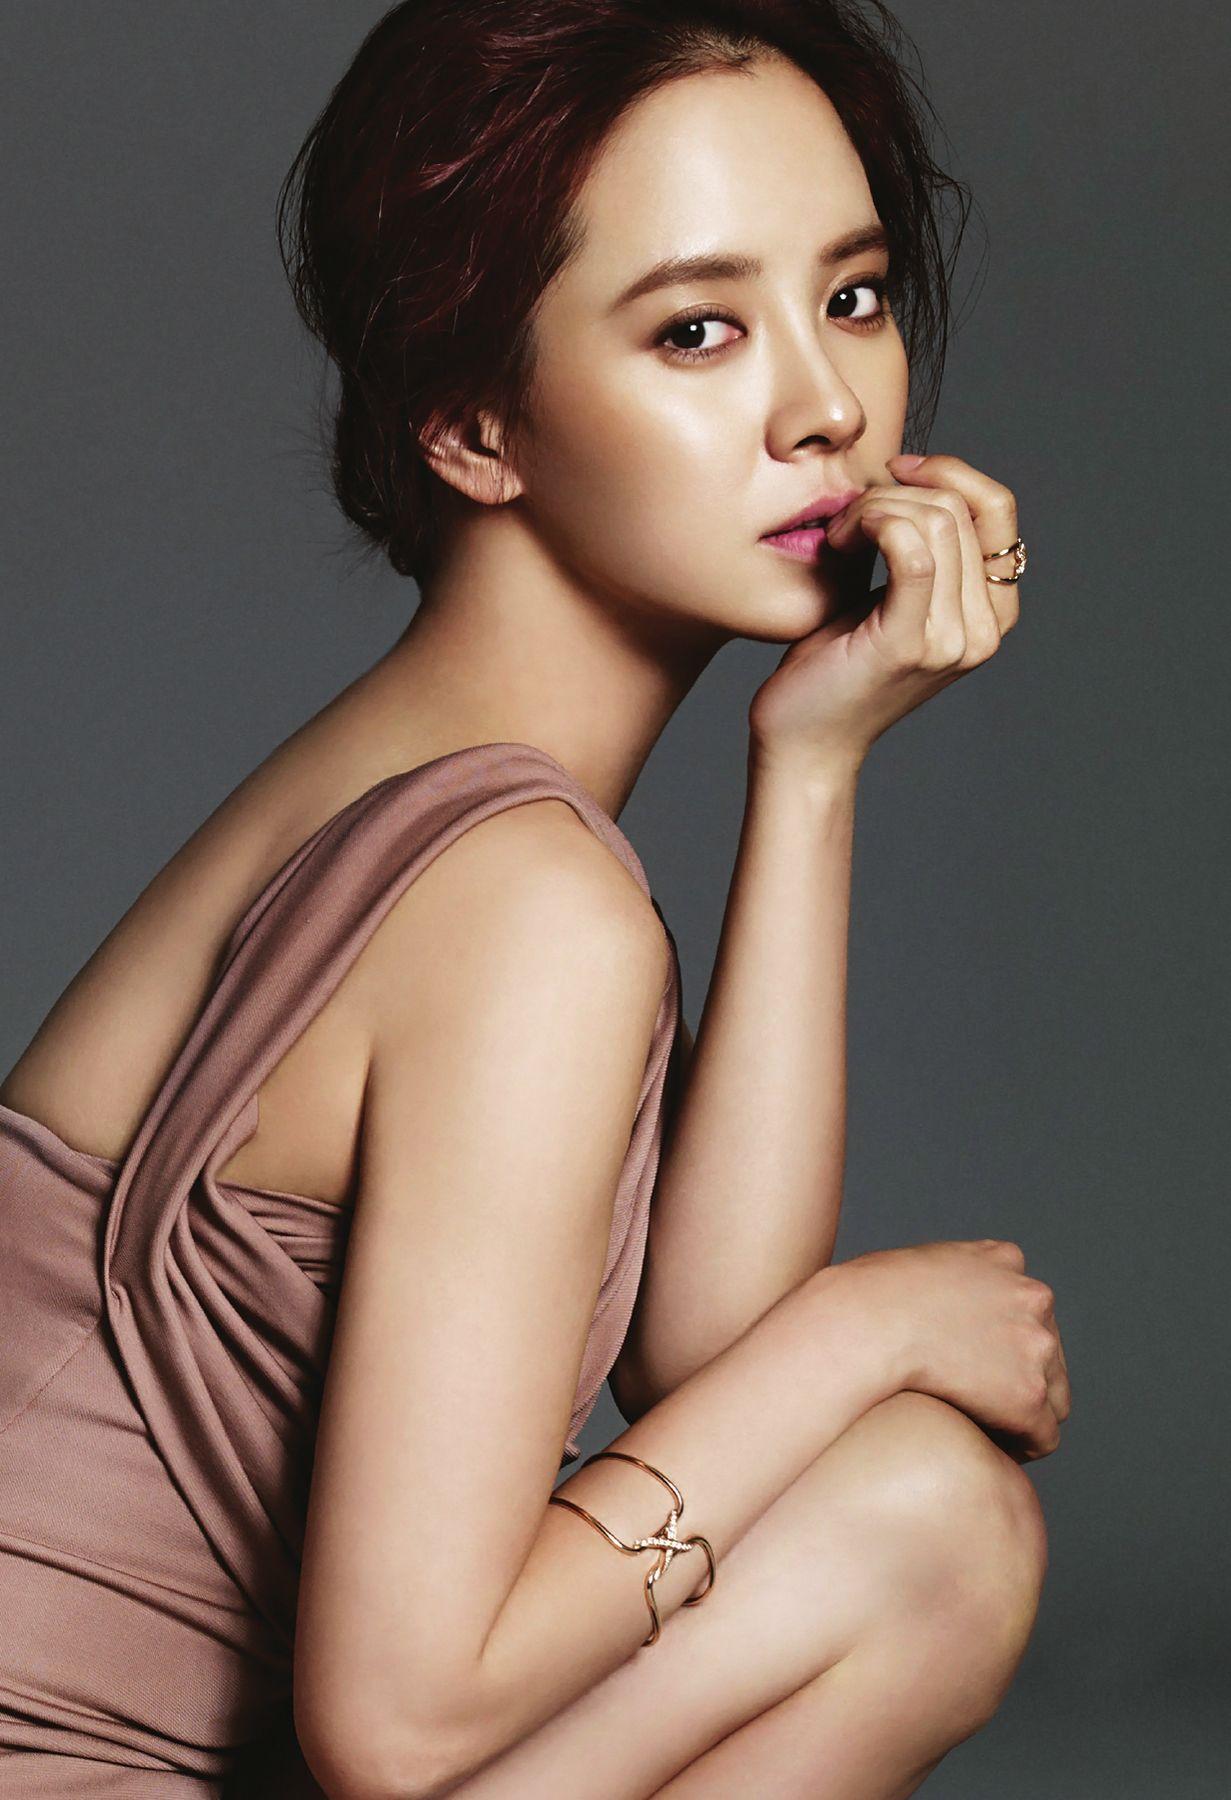 Elle girl korea song ji hyo dating. shih tzu dog for sale in bangalore dating.